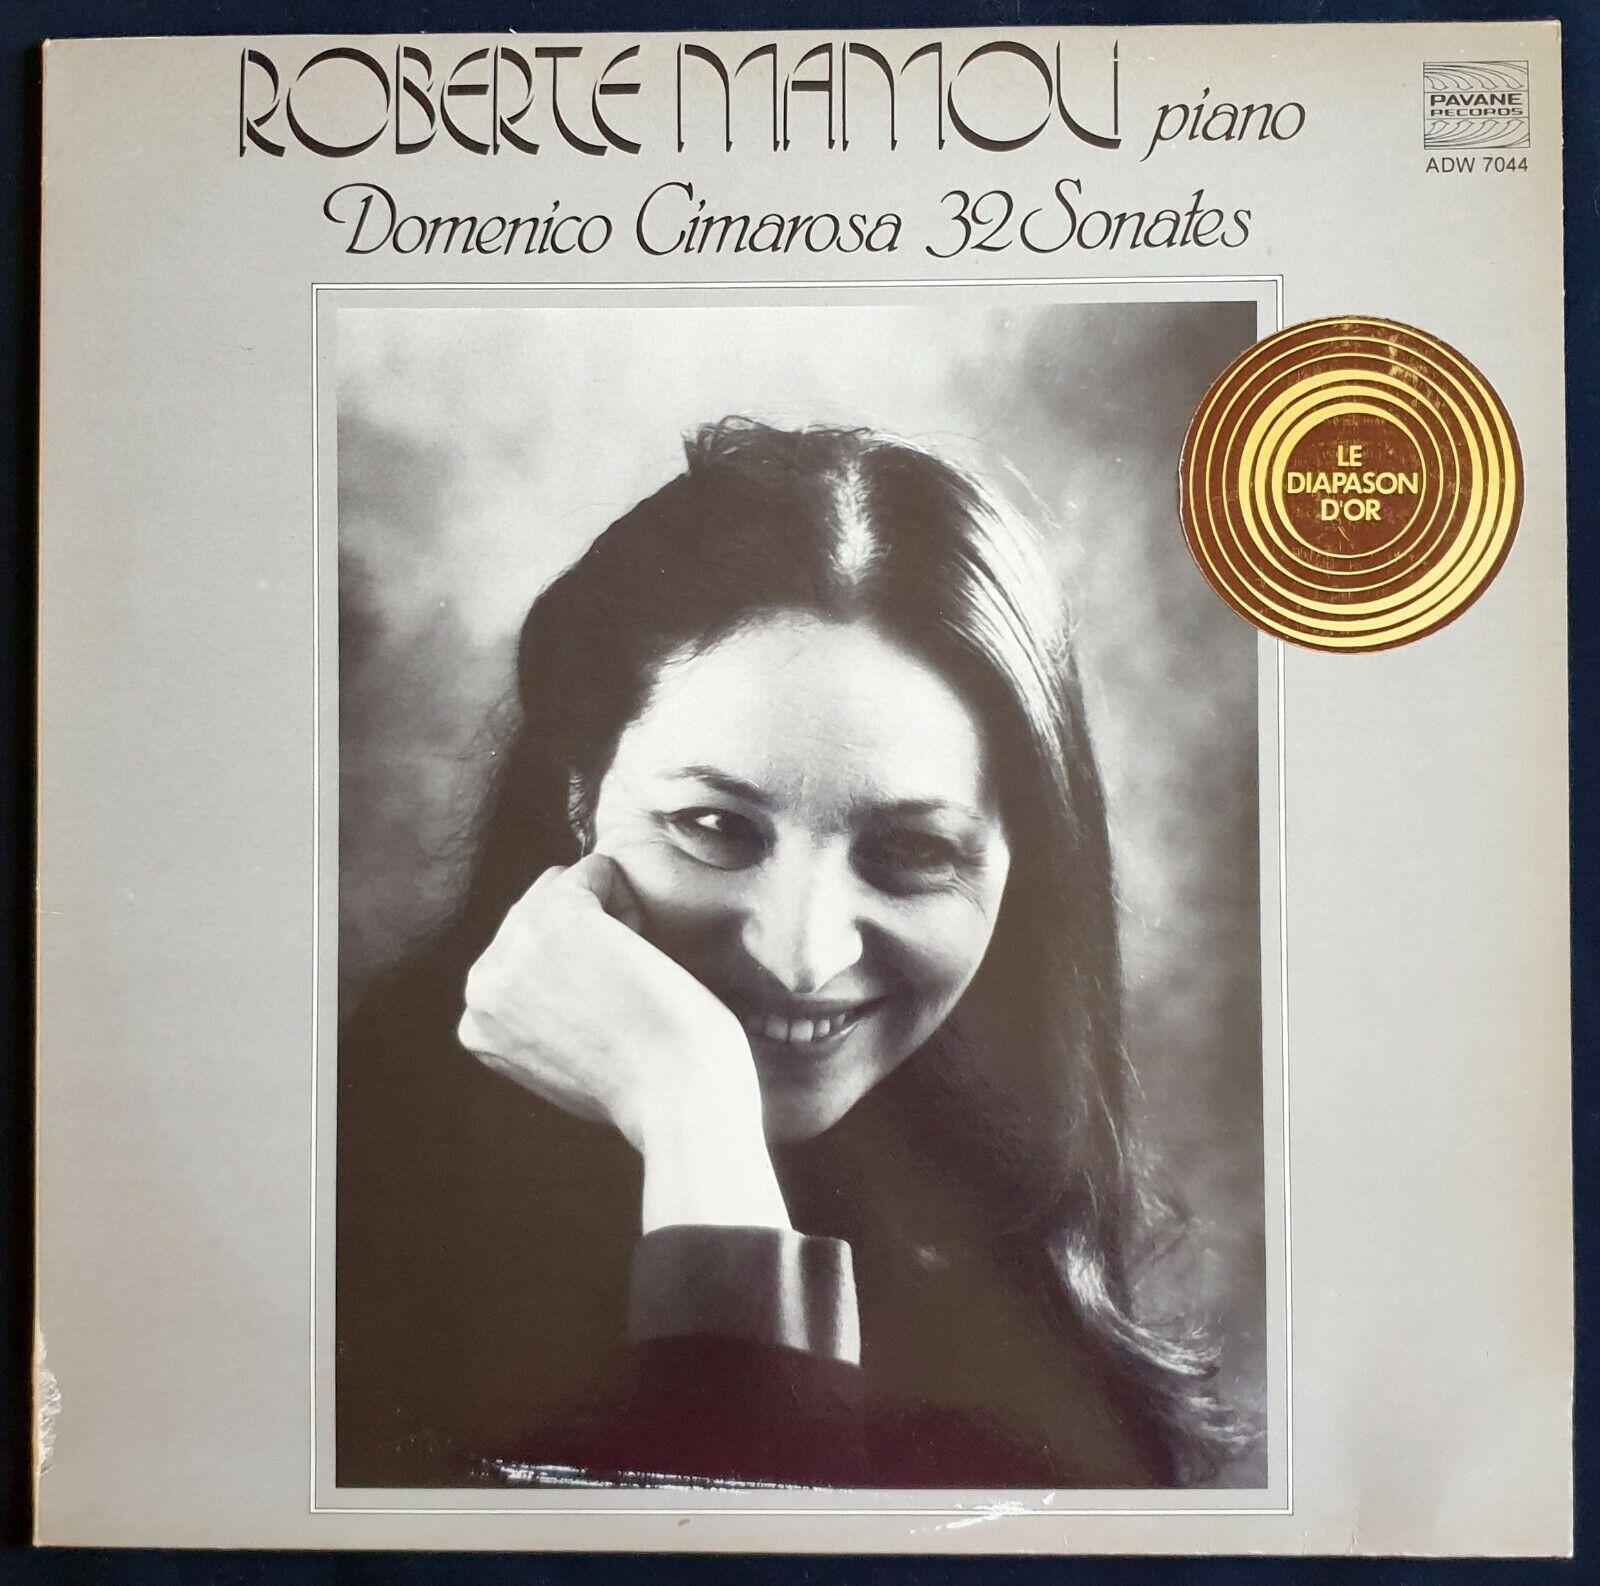 Photo 01 - PAVANE vinile LP domenico cimarosa, ROBERTE MAMOU